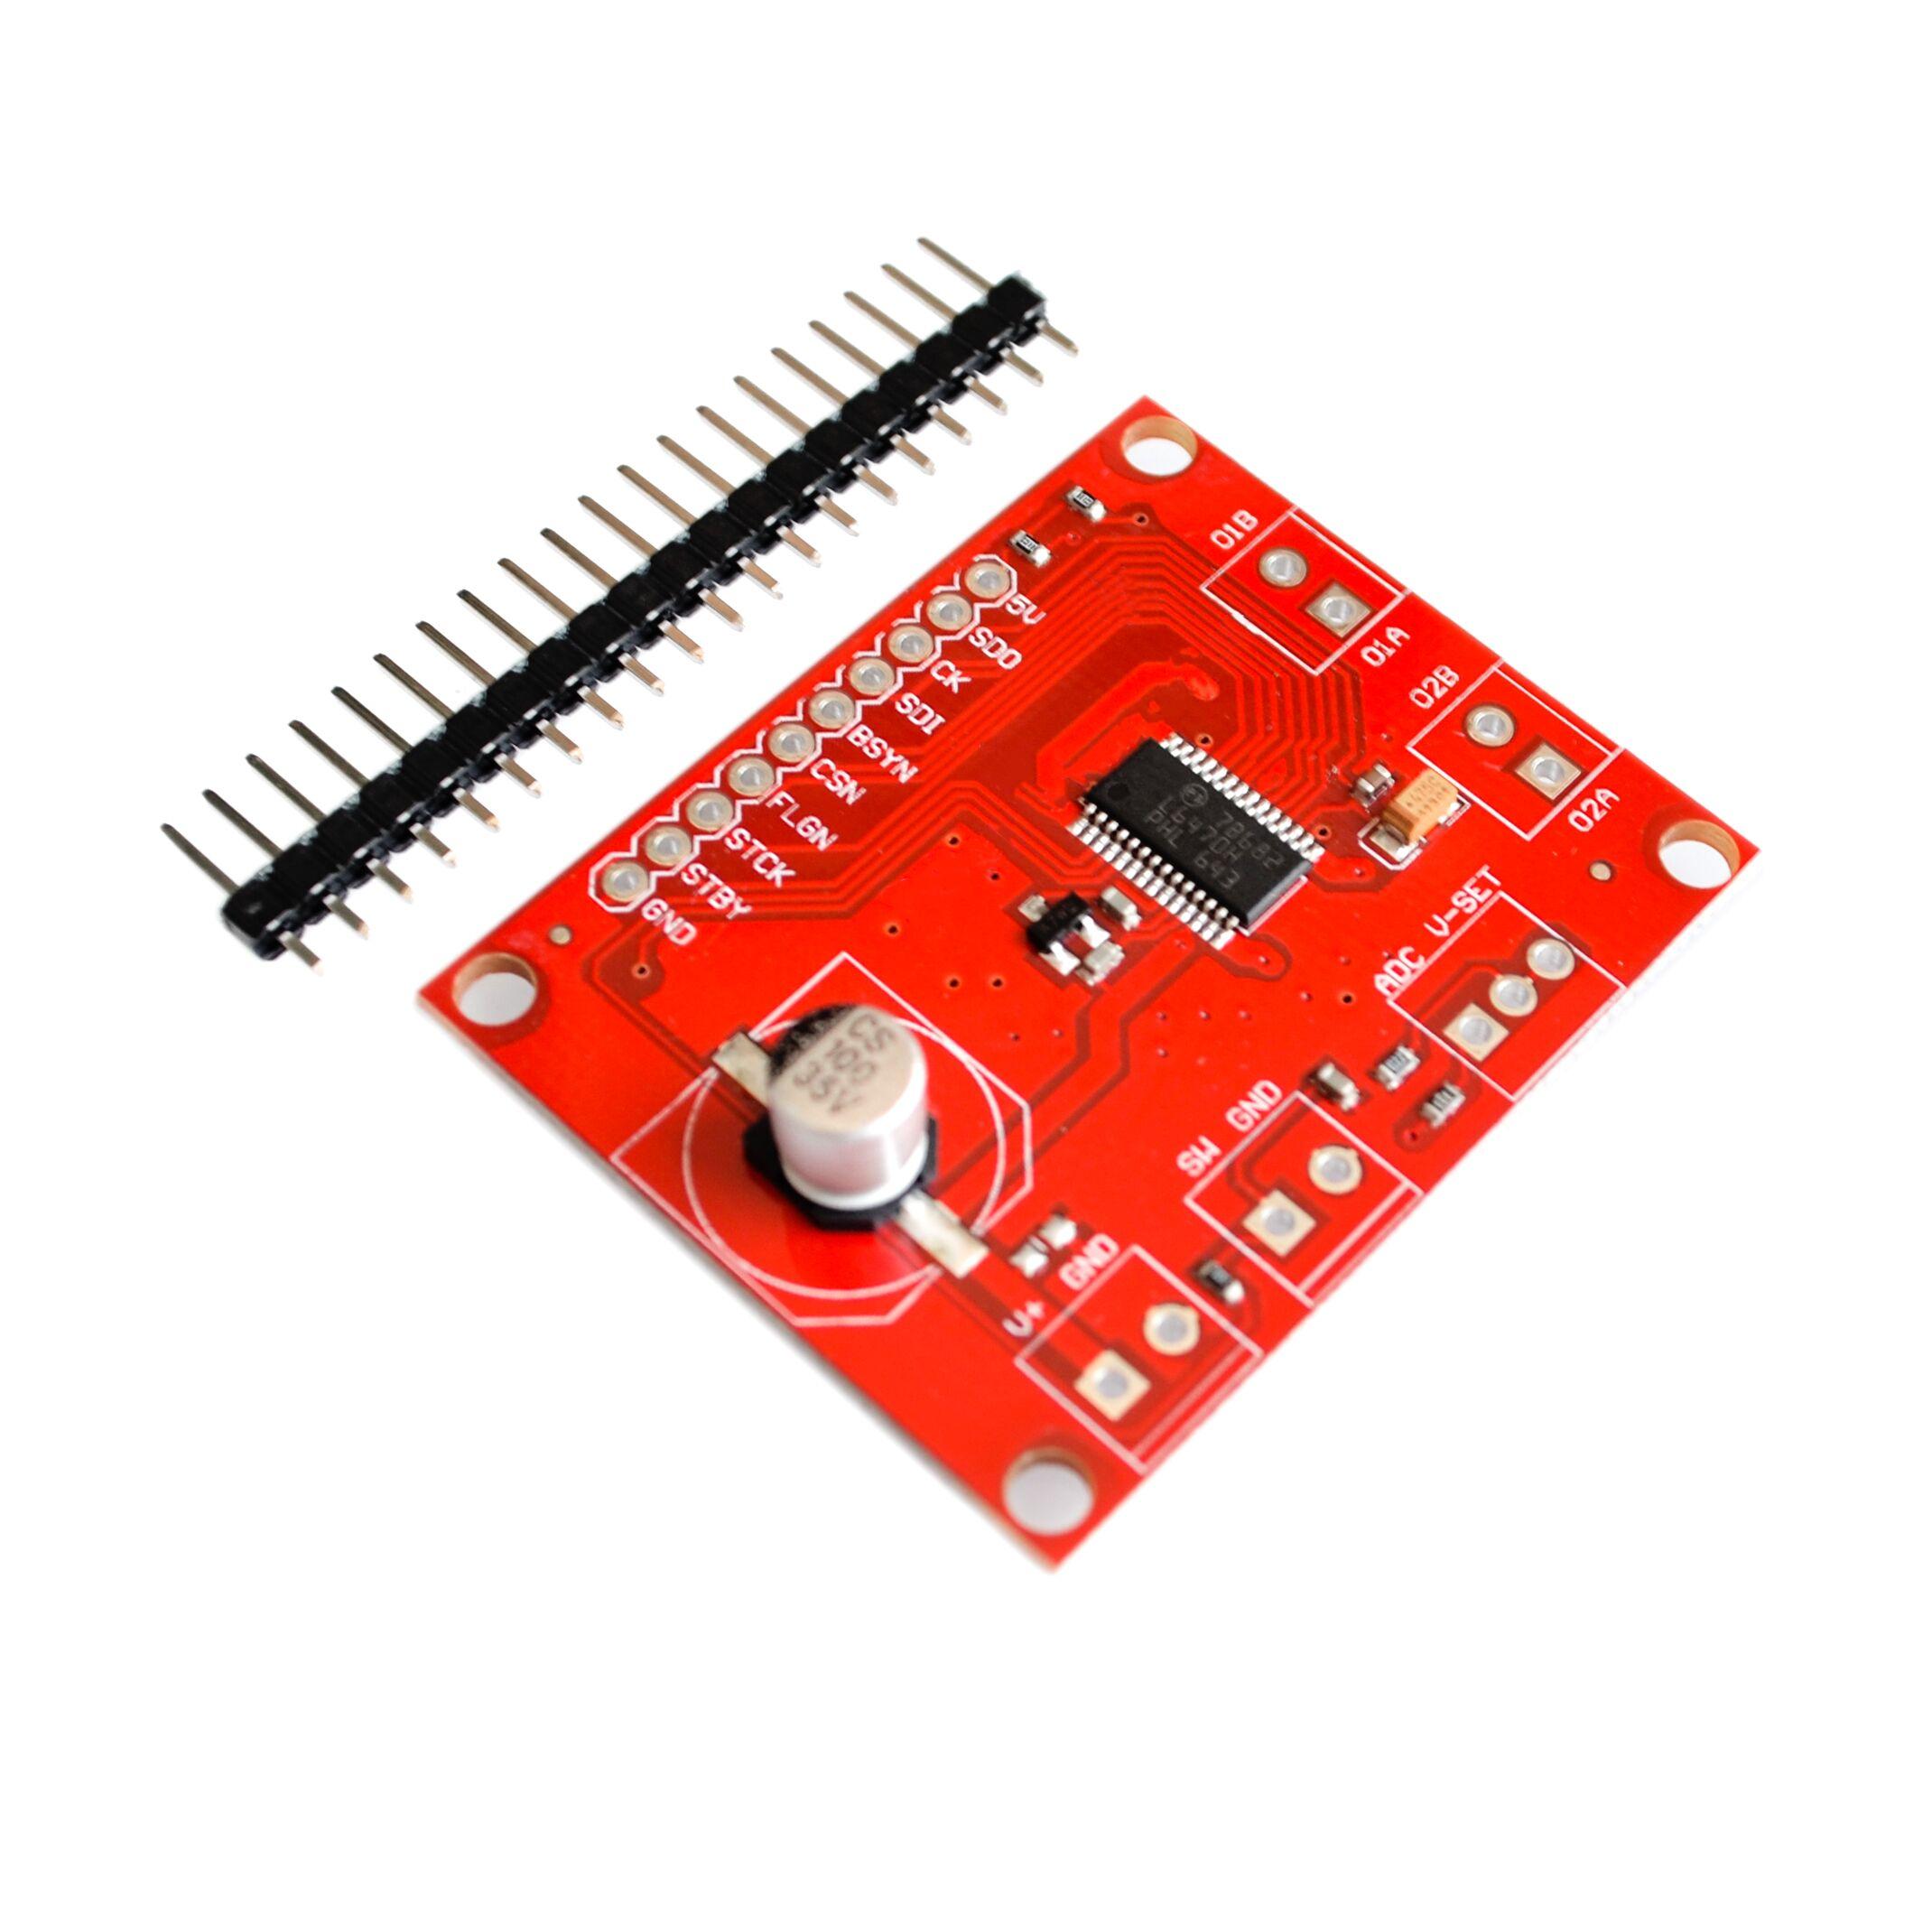 Nuevo L6470 paso a paso-conductor de adaptación 3A 8-45V bipolar paso a paso-tarjeta de control para motor para